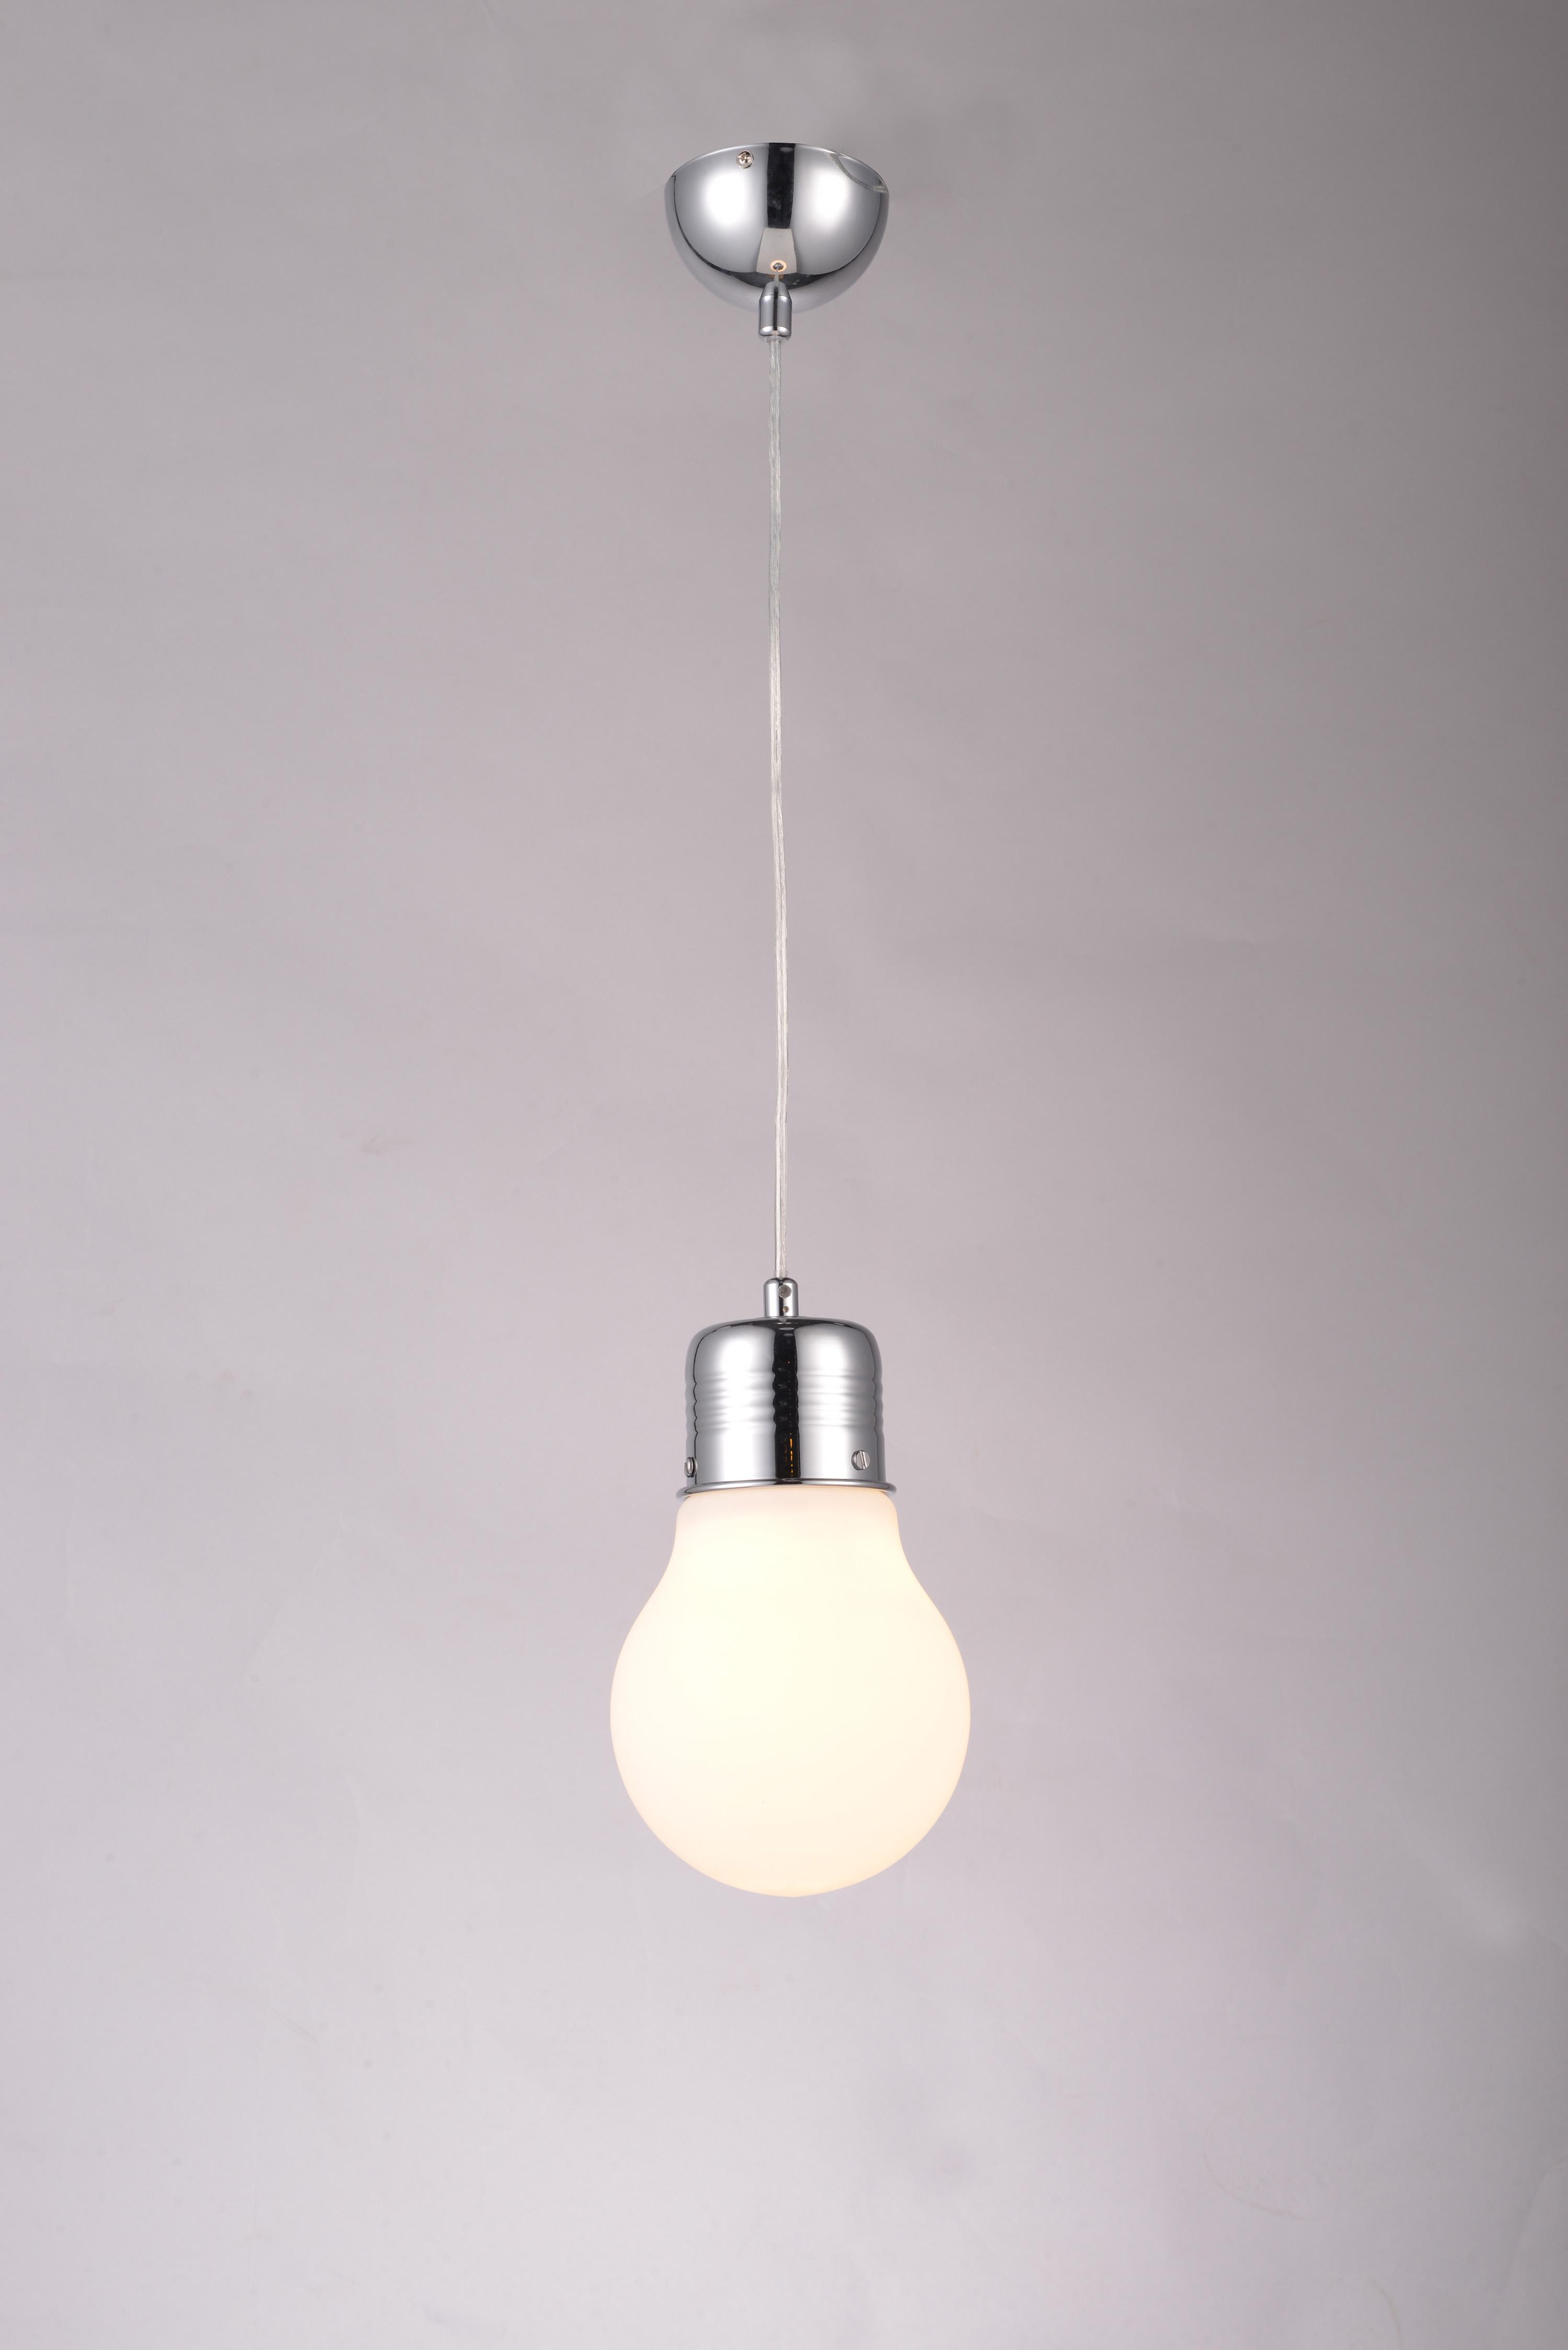 Glass shade Bulb ball pendant light